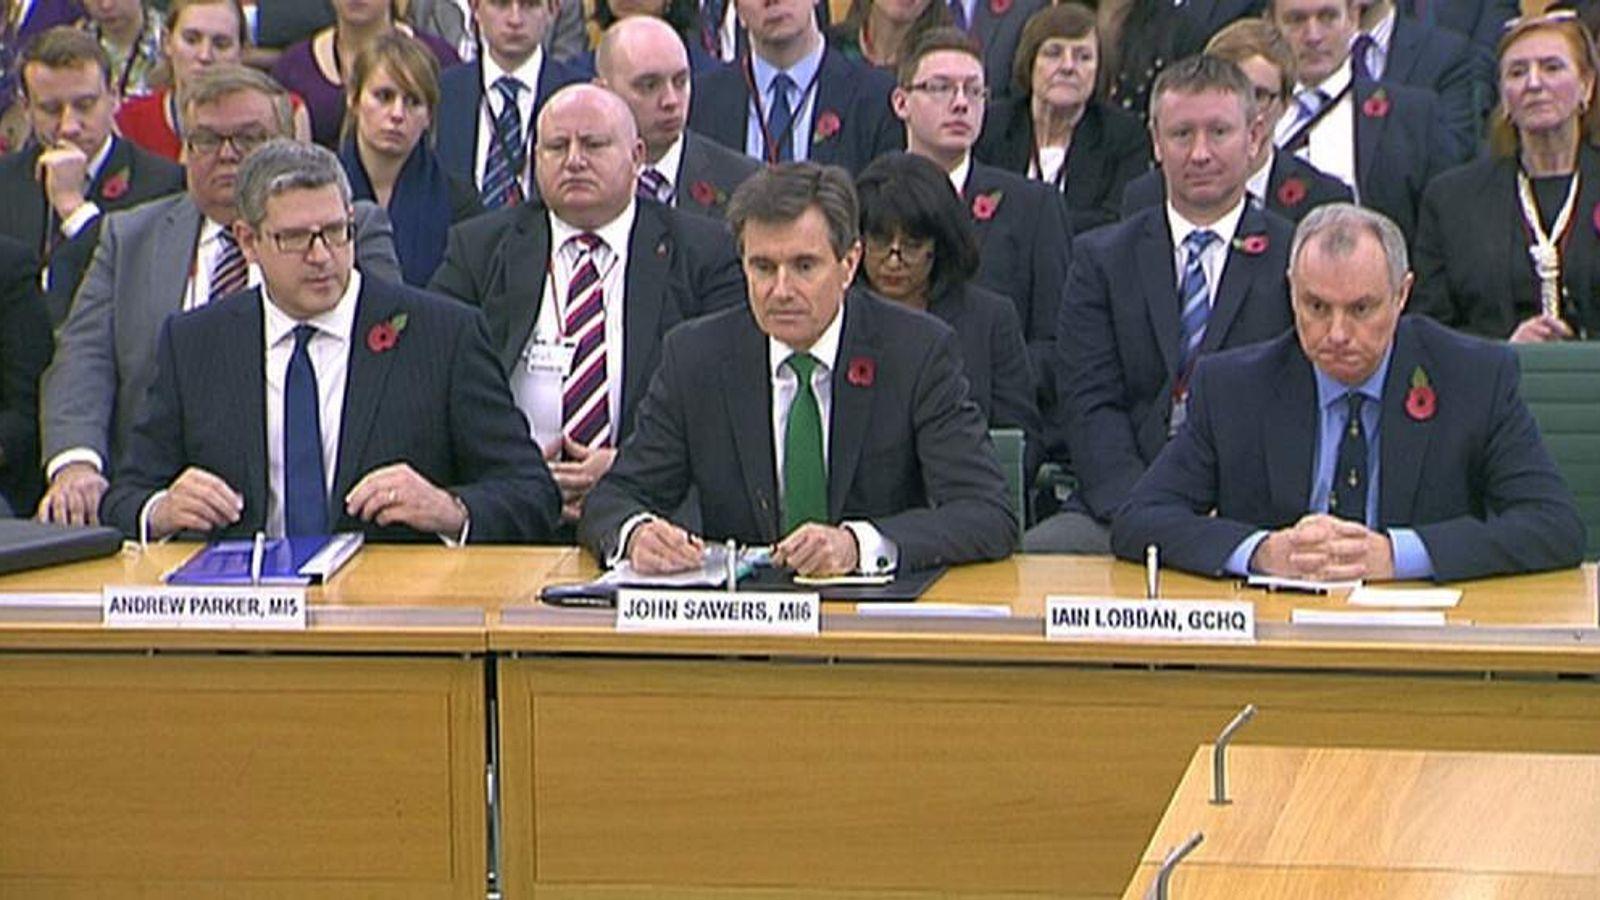 heads of MI5 MI6 and GCHQ